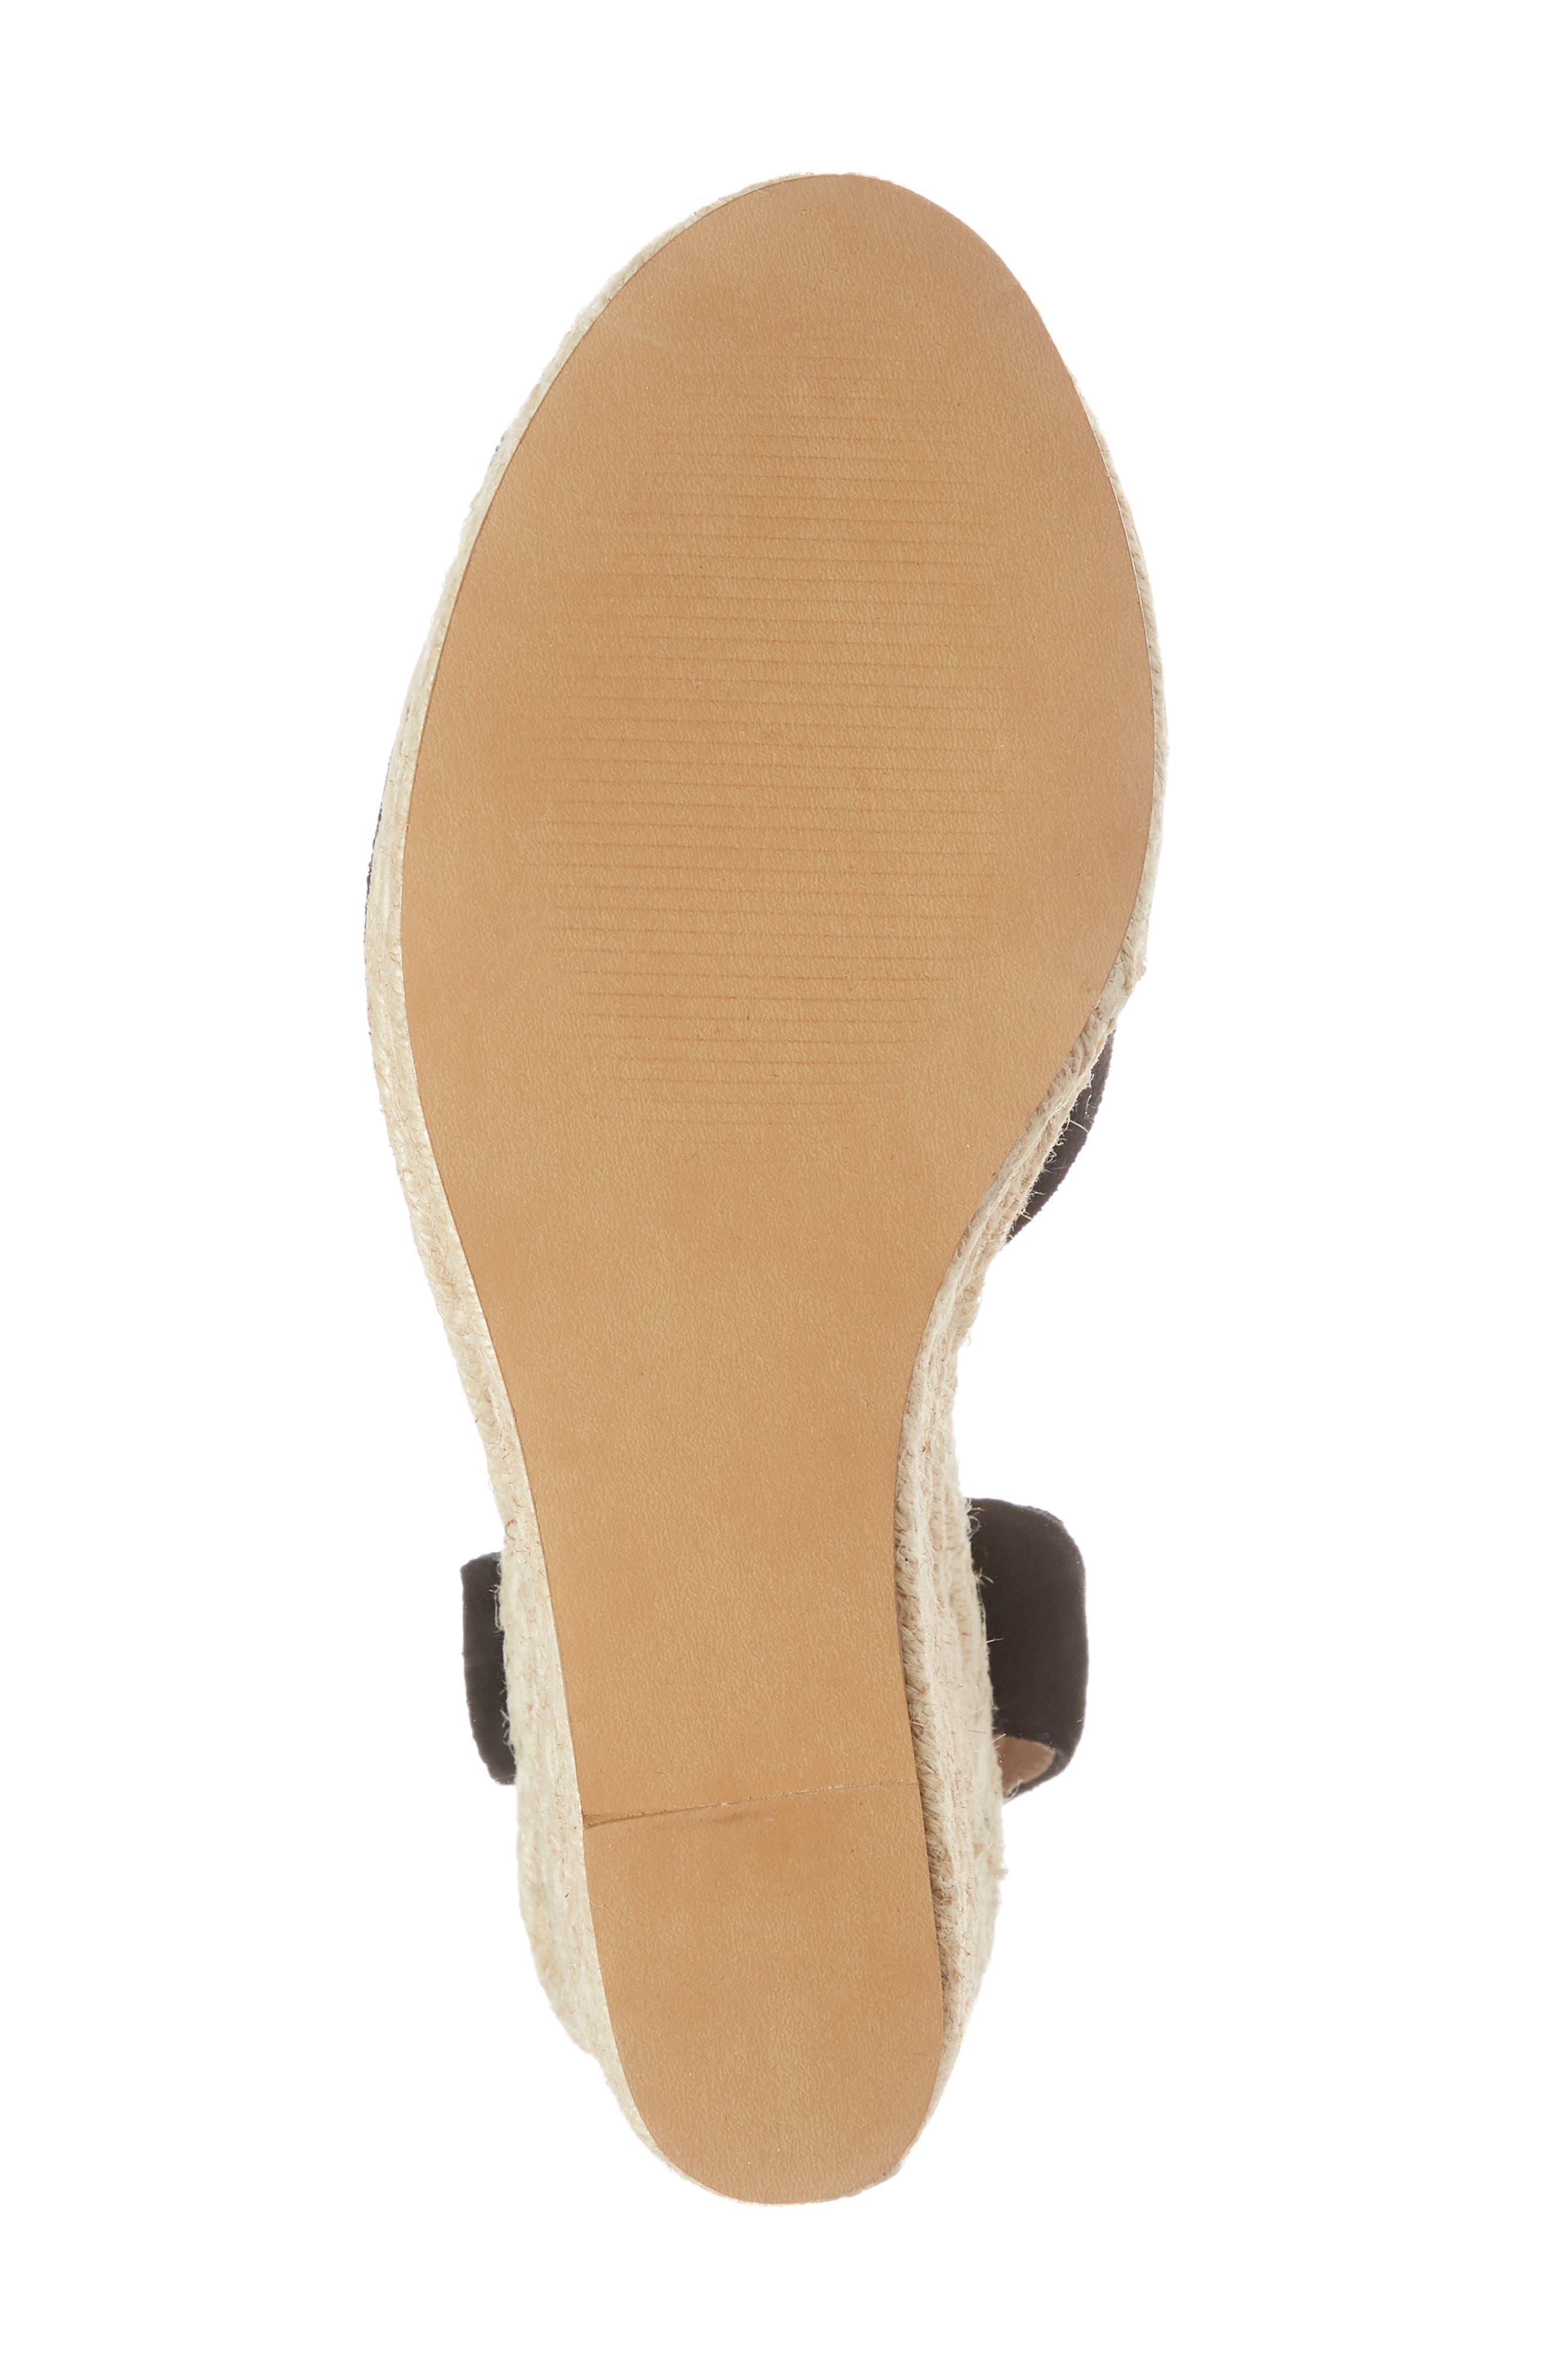 Secret Wedge Wraparound Sandal,                             Alternate thumbnail 6, color,                             Black Suede